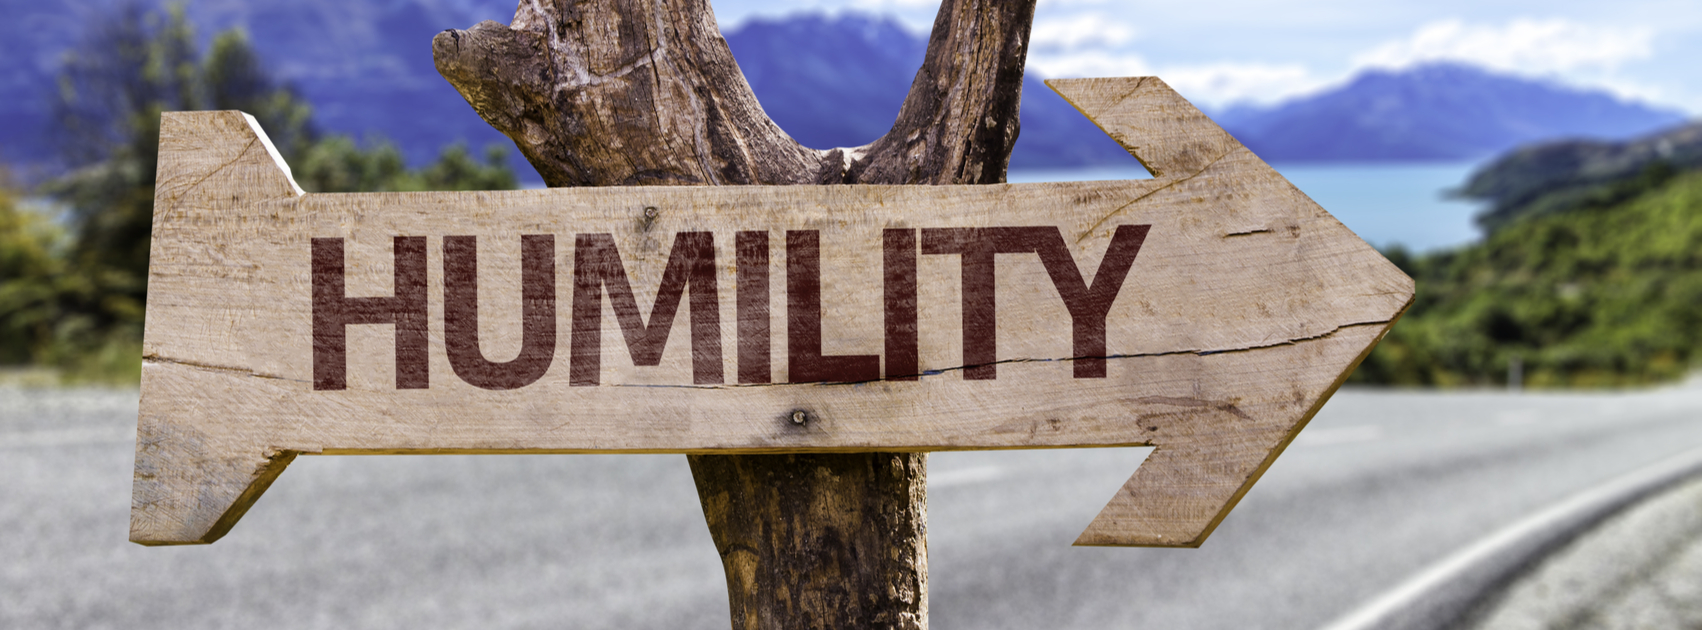 Humility pic